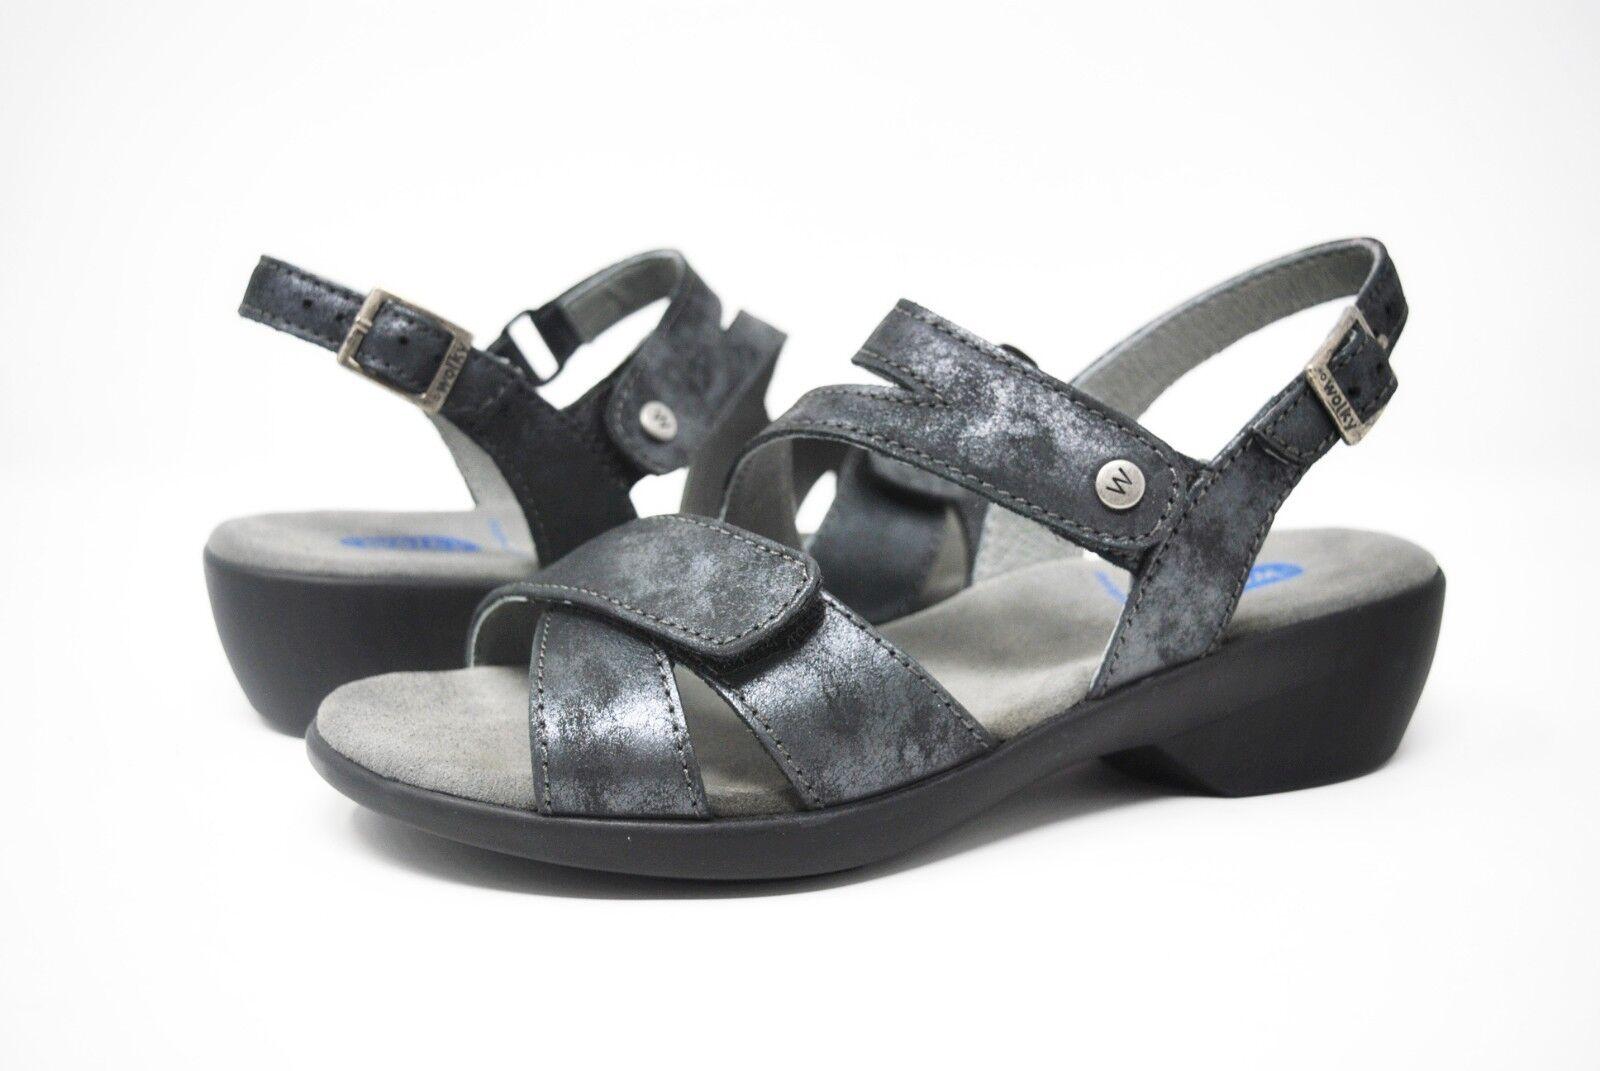 Calvin Klein Nalo Caged Strappy Sandal 7 M Black/White/Le<wbr/>mon E7668  New with Box